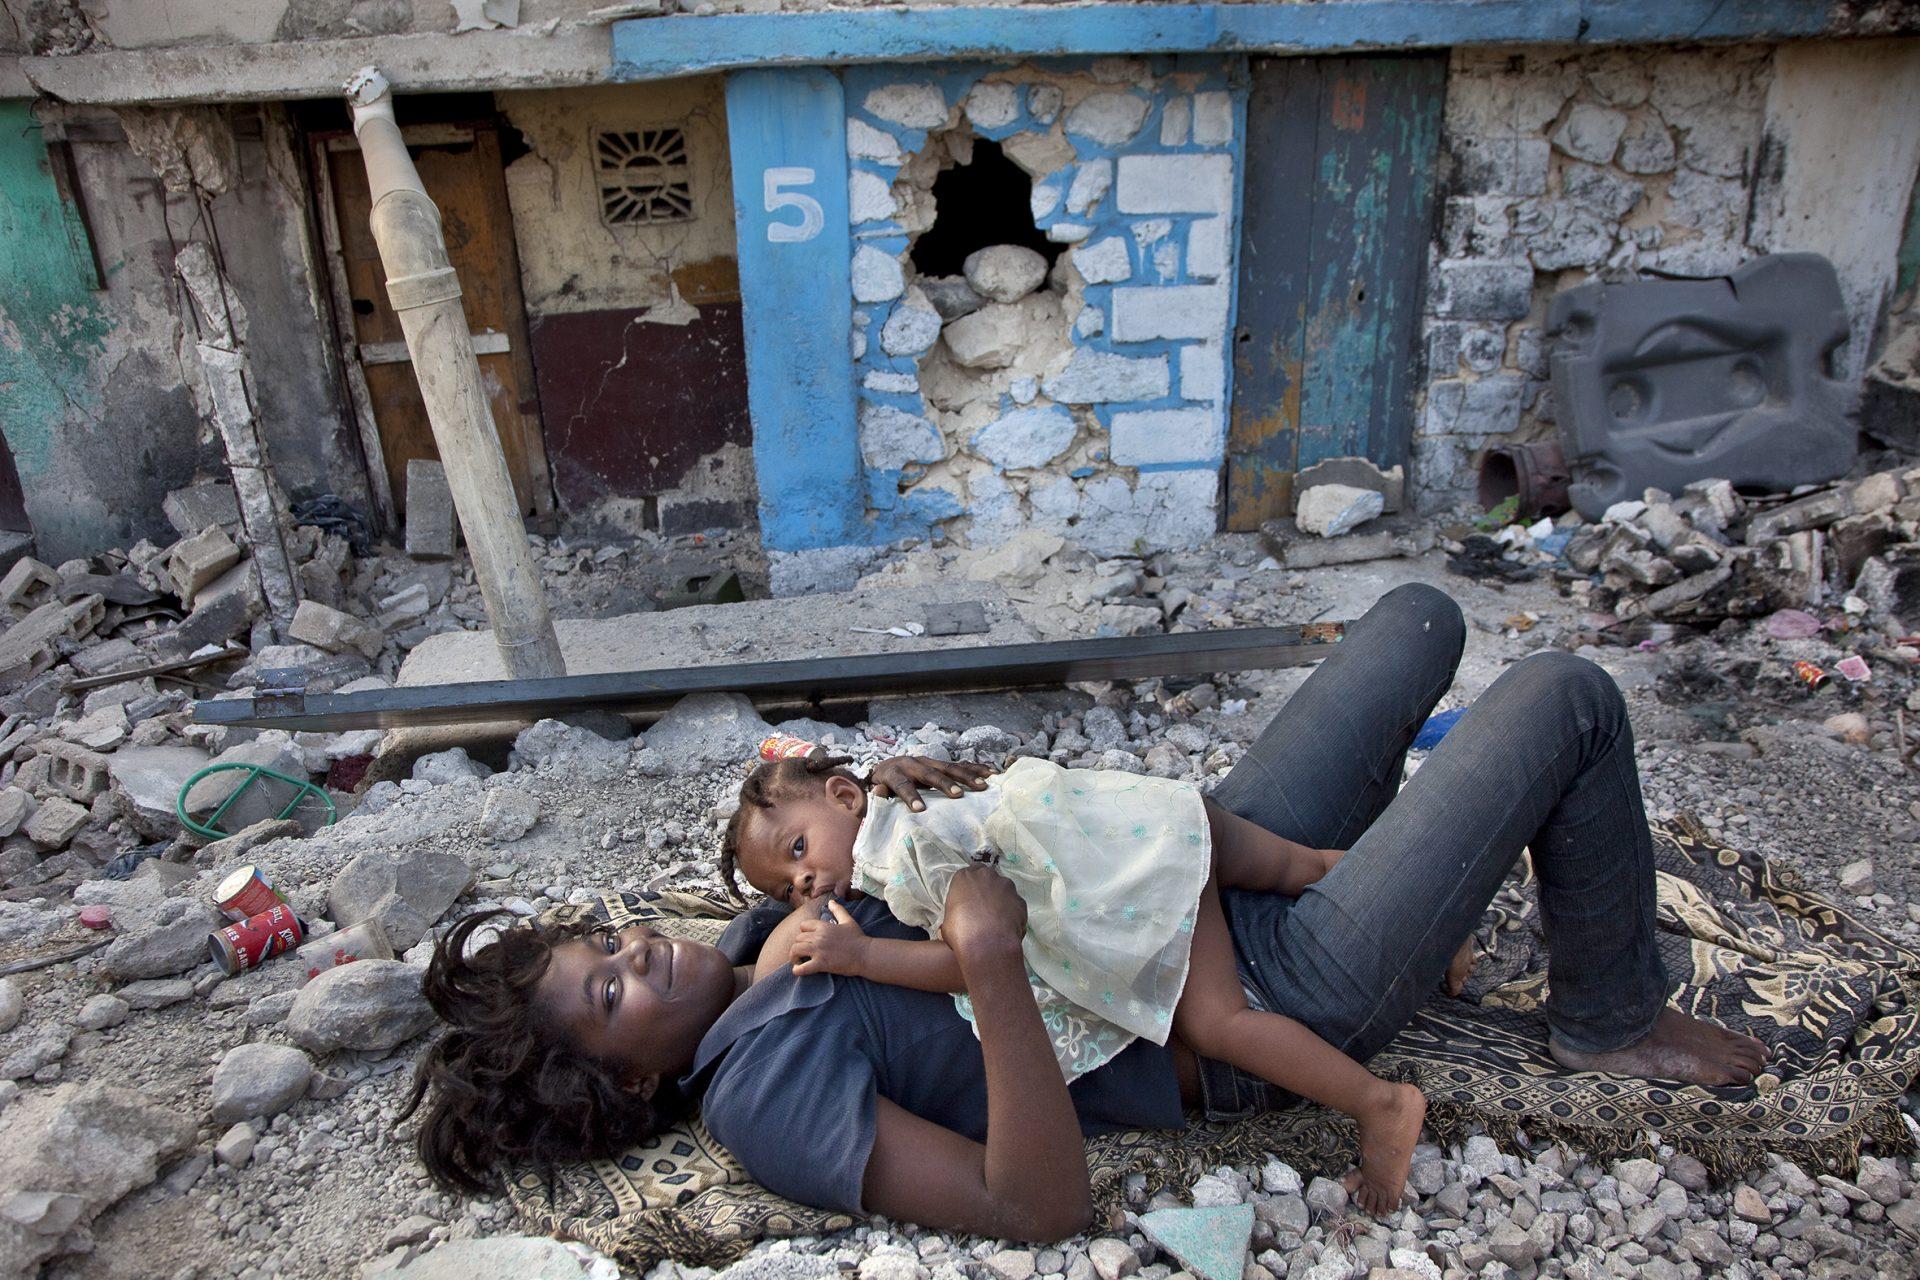 HAITI-CAP ANAMUR HILFT DEN ERDBEBENOPFERN